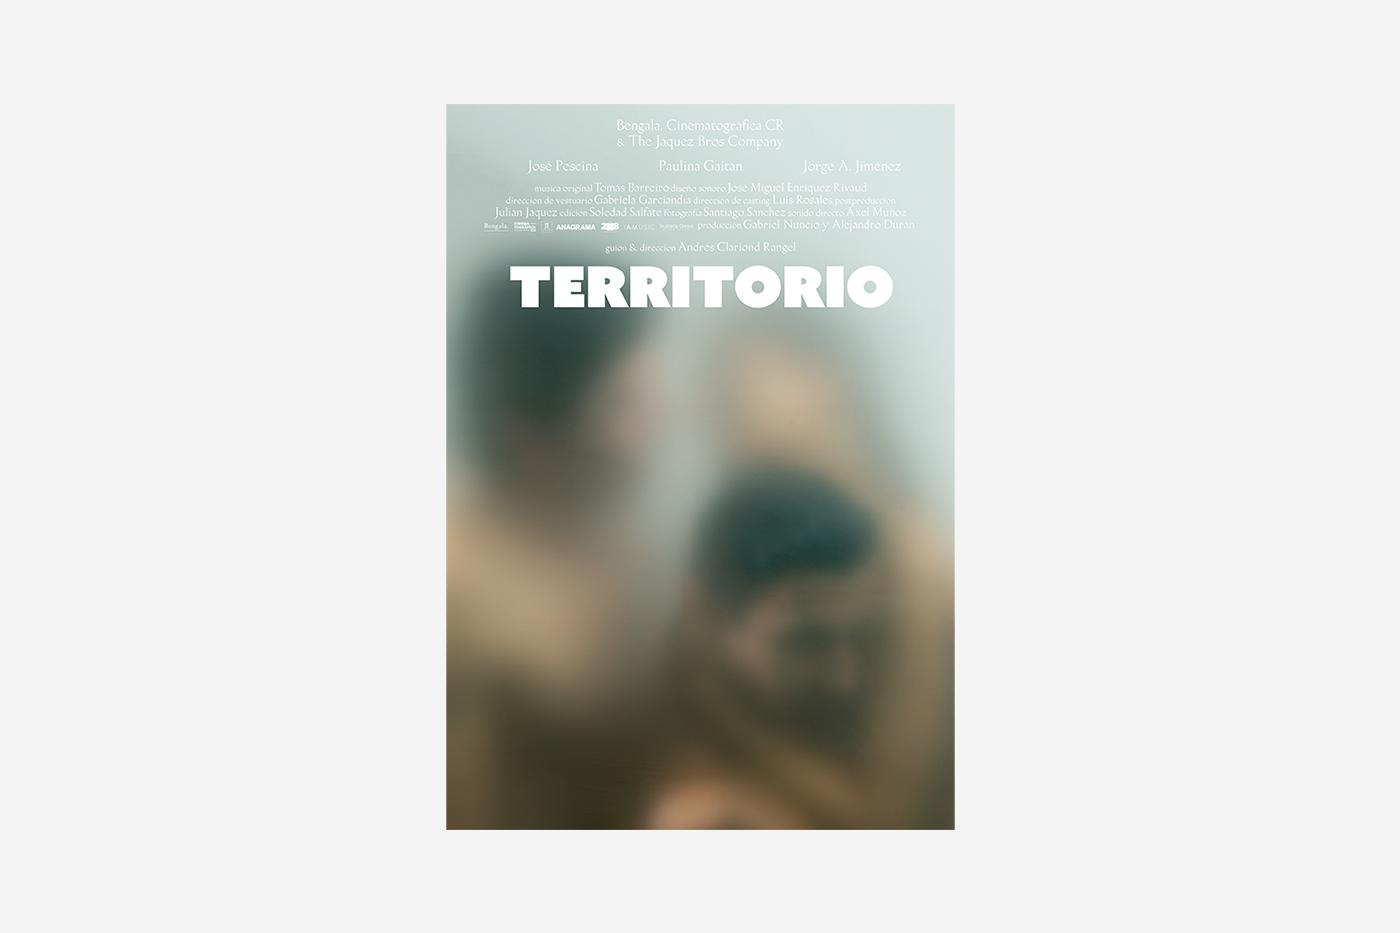 cine poster ArtDirection art Photography  Film   filmfestival drama cartel CartelDesign